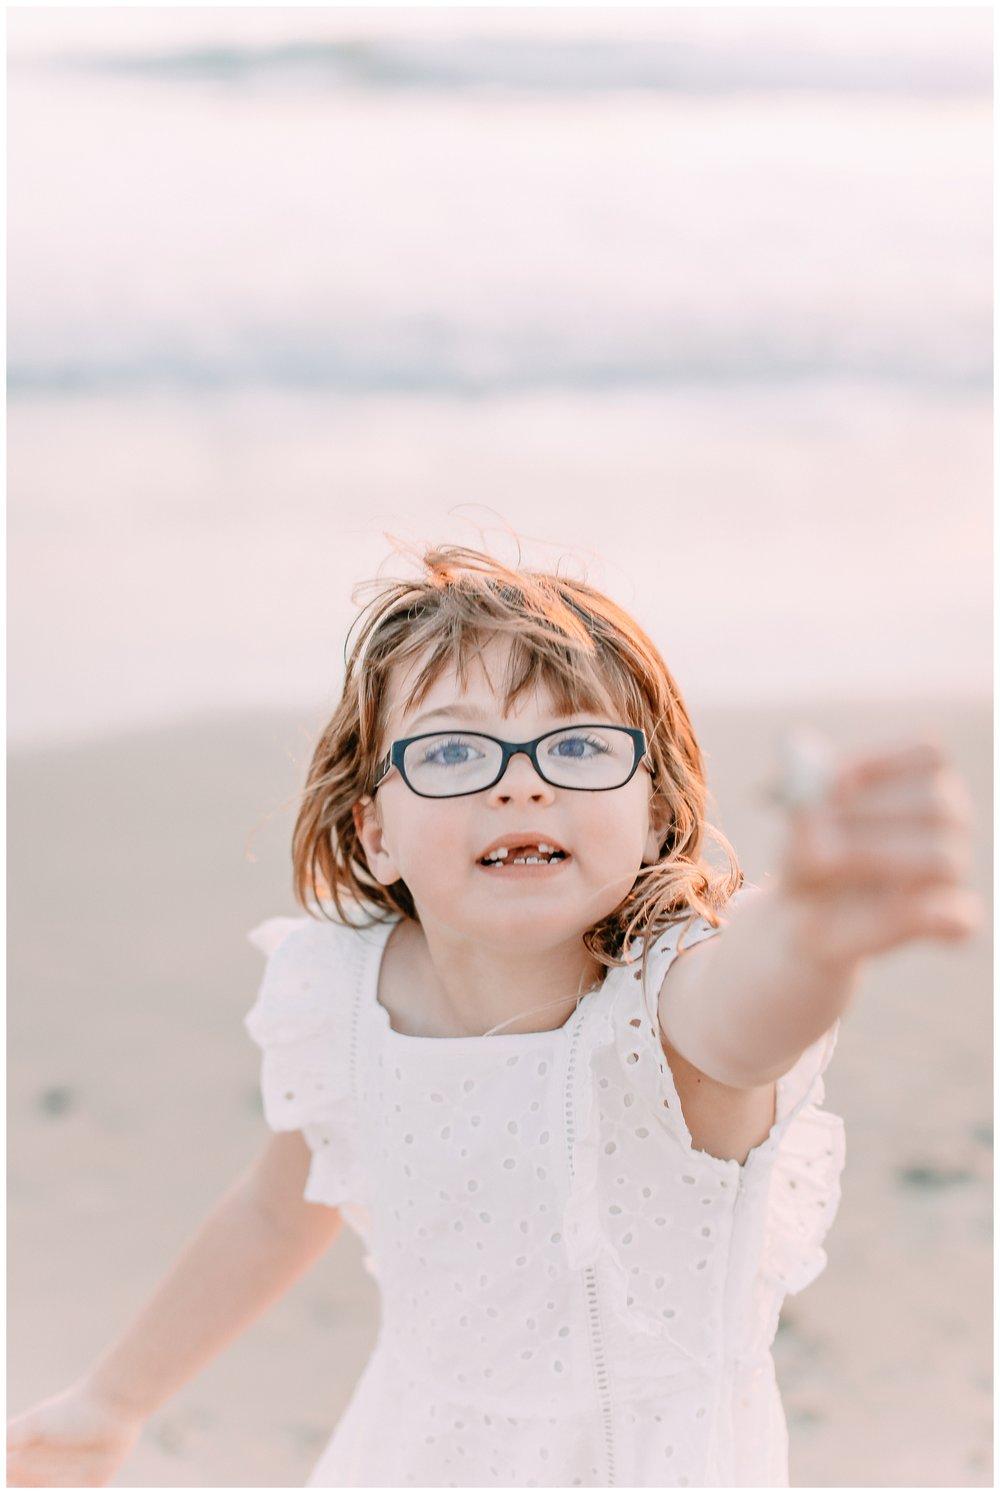 San_clemente_family_session_Orange_county_family_photographer_cori_kleckner_photography_laguna_beach_family_session_0703.jpg